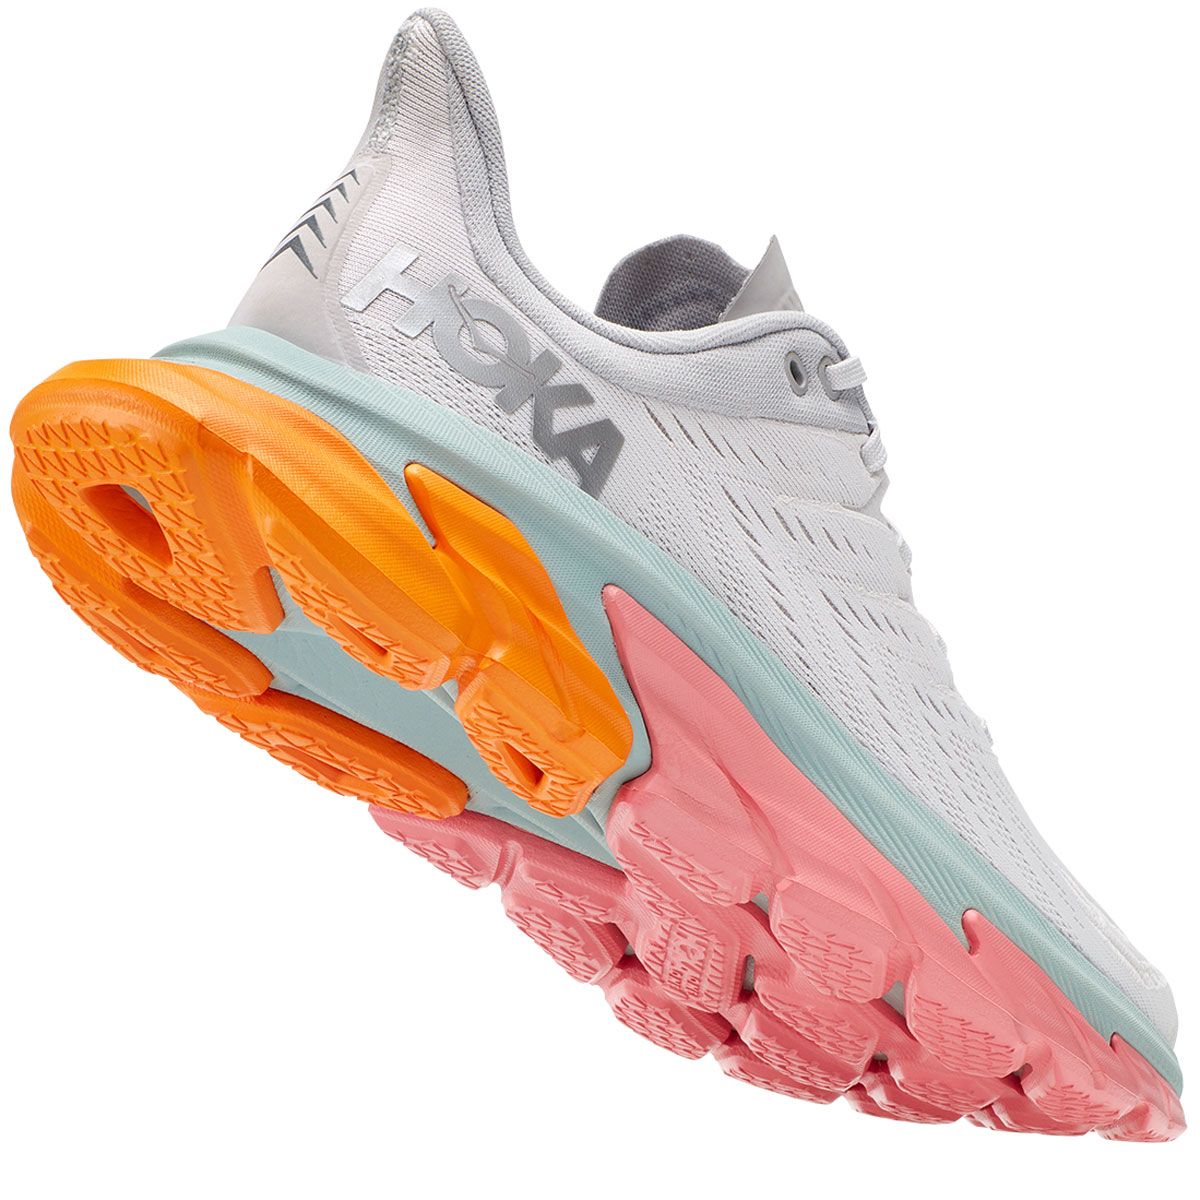 Men's Hoka One One Clifton Edge Running Shoe - Color: Nimbus Cloud/Lunar Rock - Size: 7 - Width: Regular, Nimbus Cloud/Lunar Rock, large, image 5